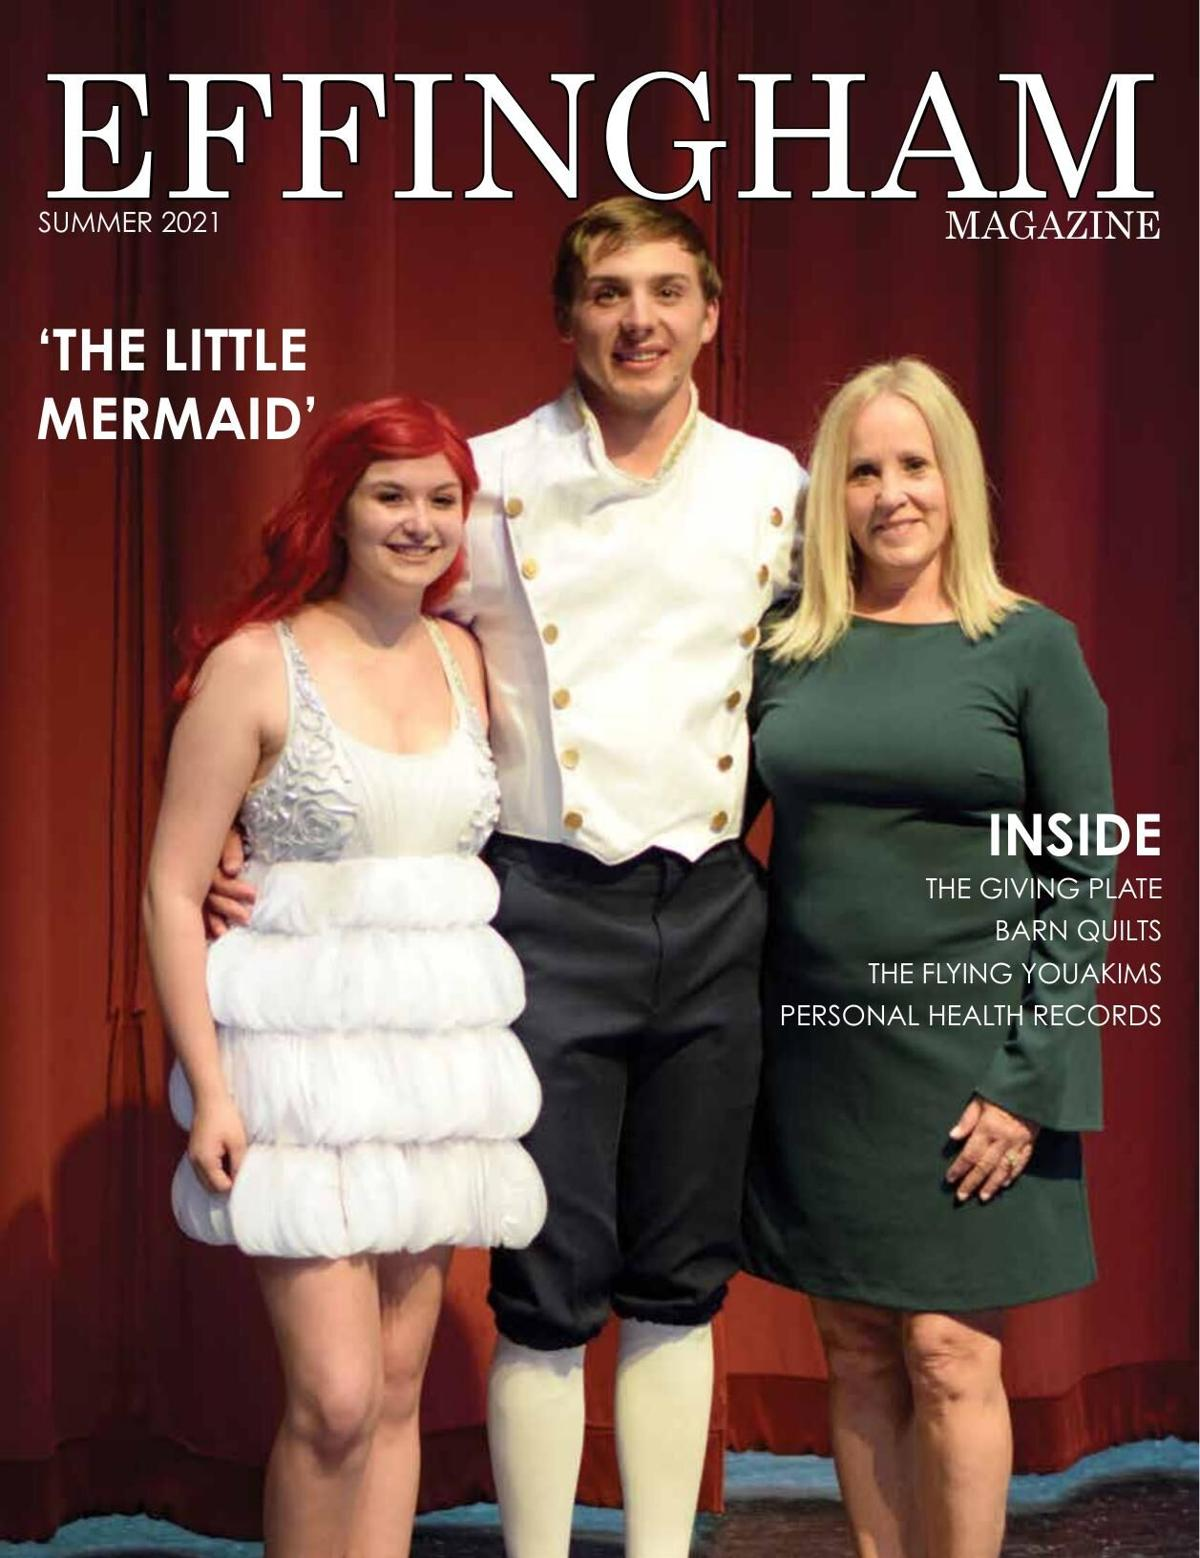 Summer 2021 Effingham Magazine